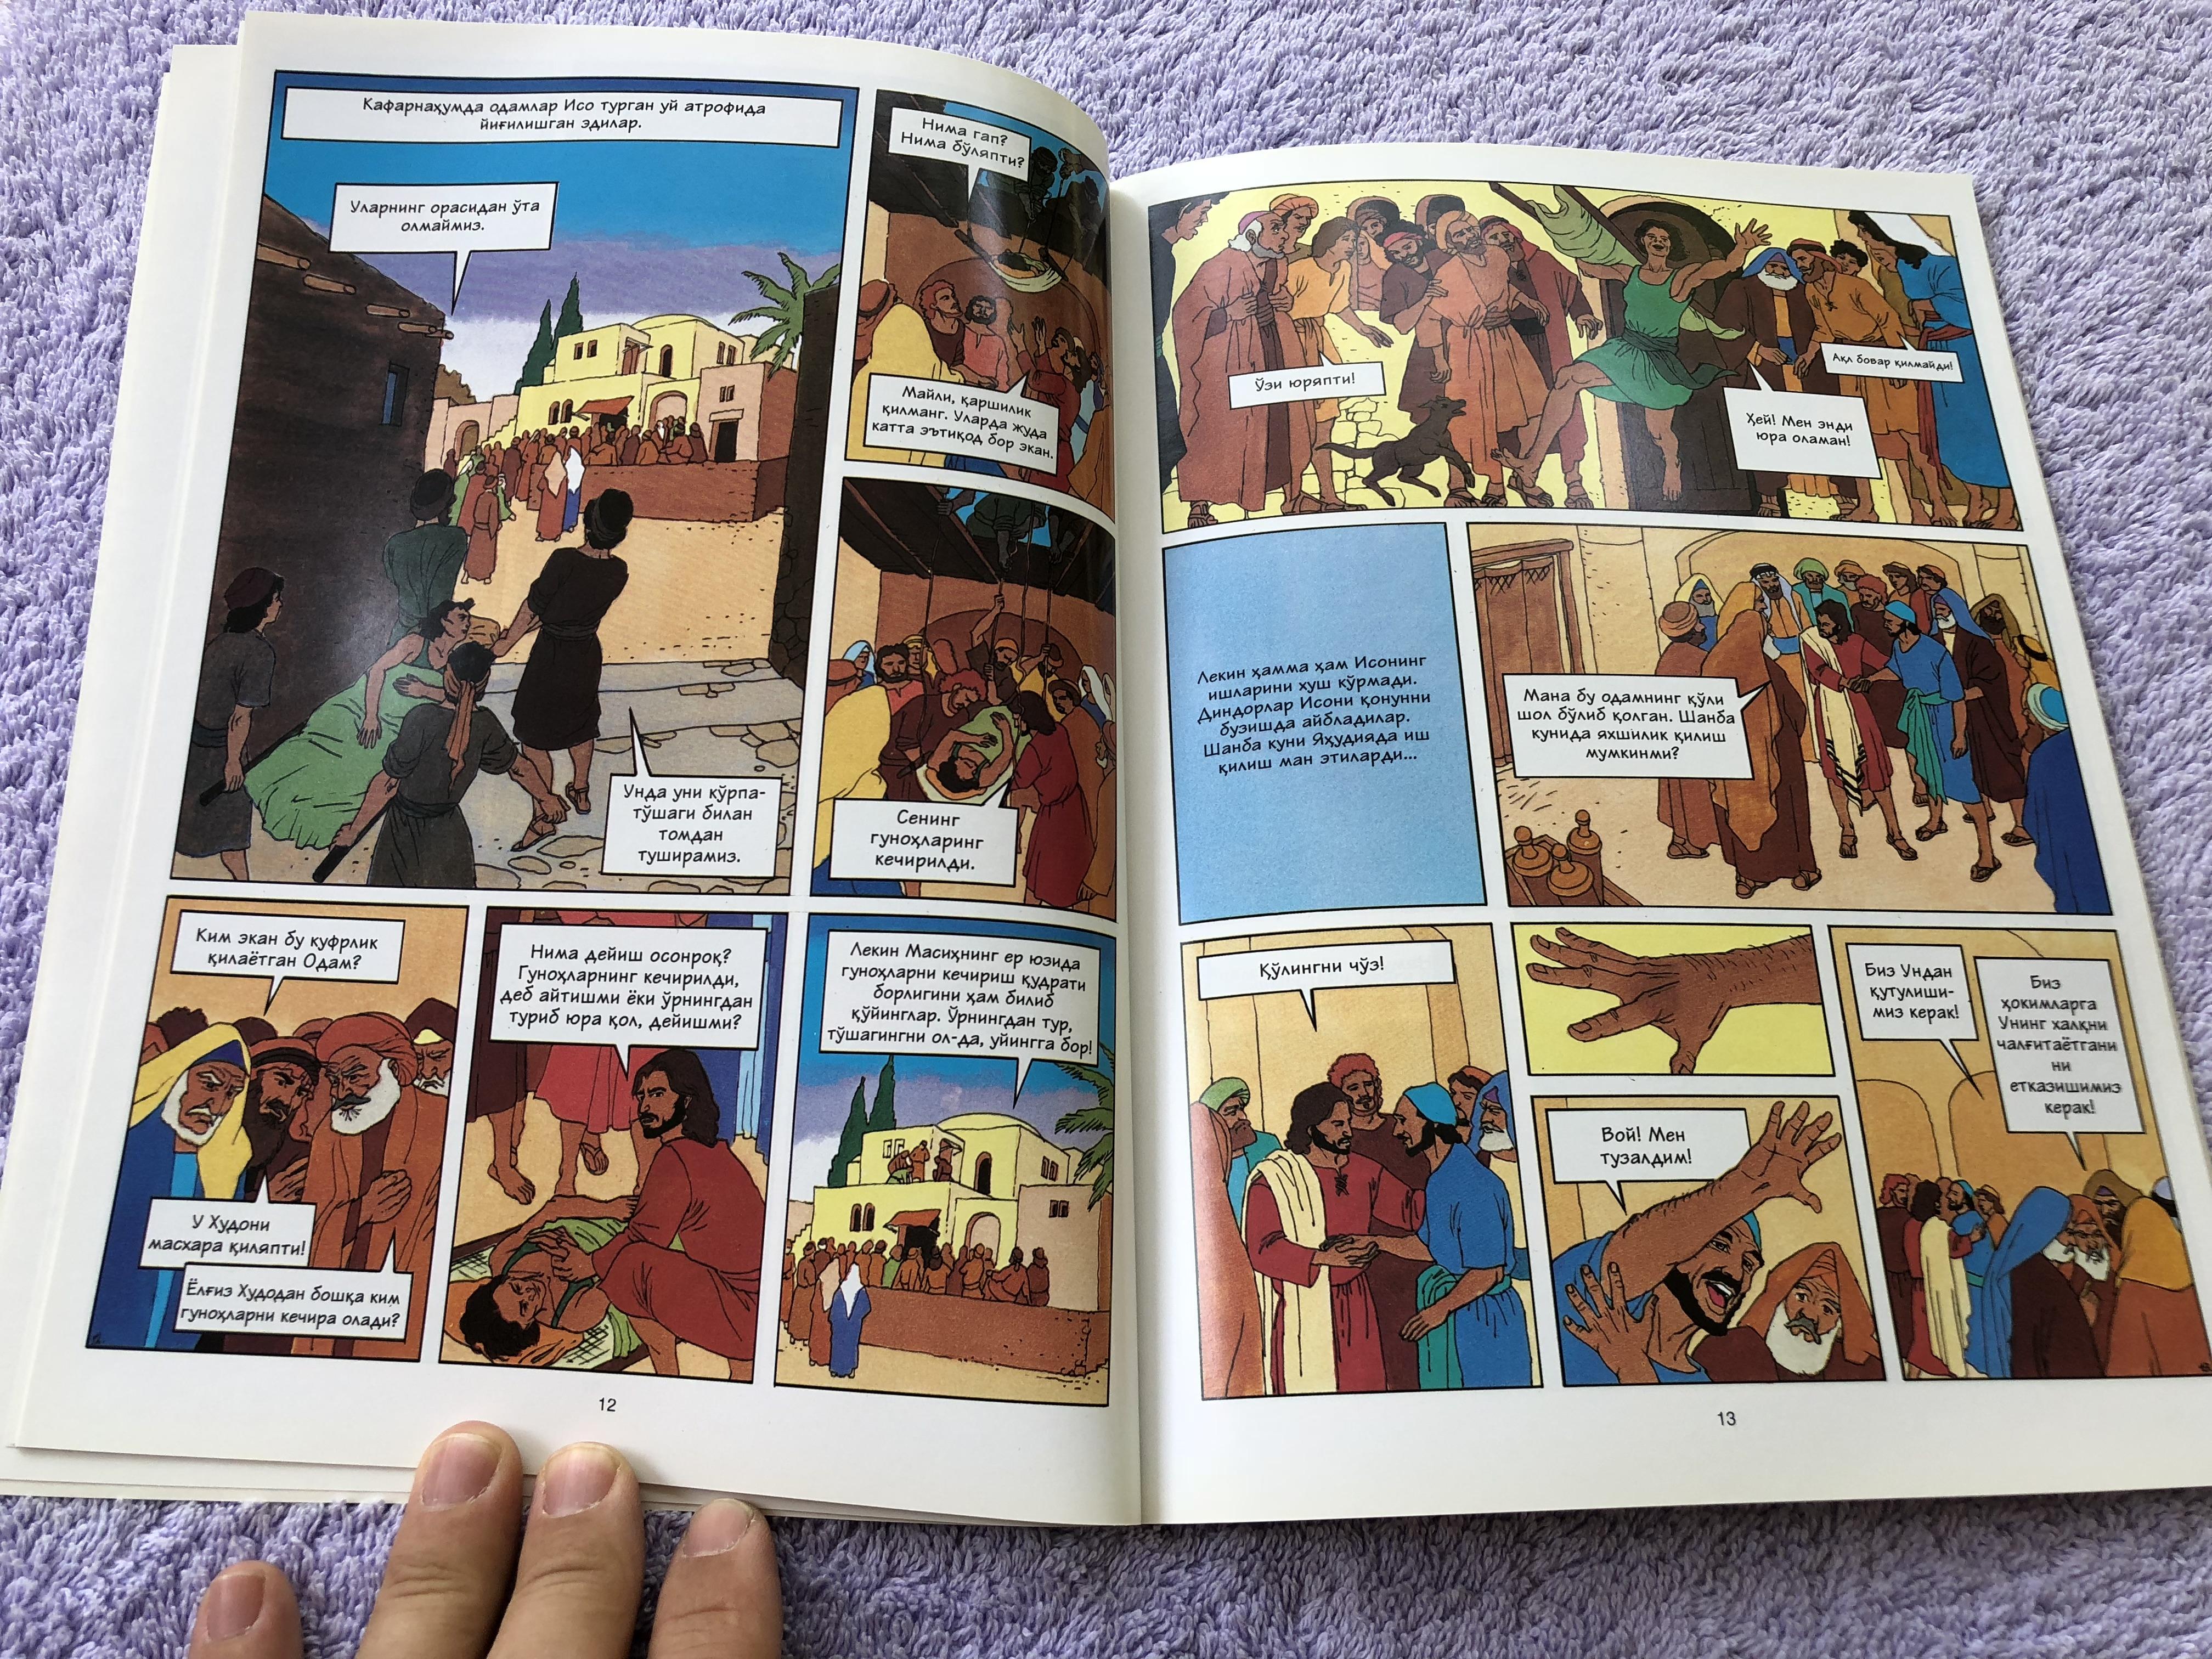 iso-mashi-uzbek-comic-strip-bible-5-.jpg